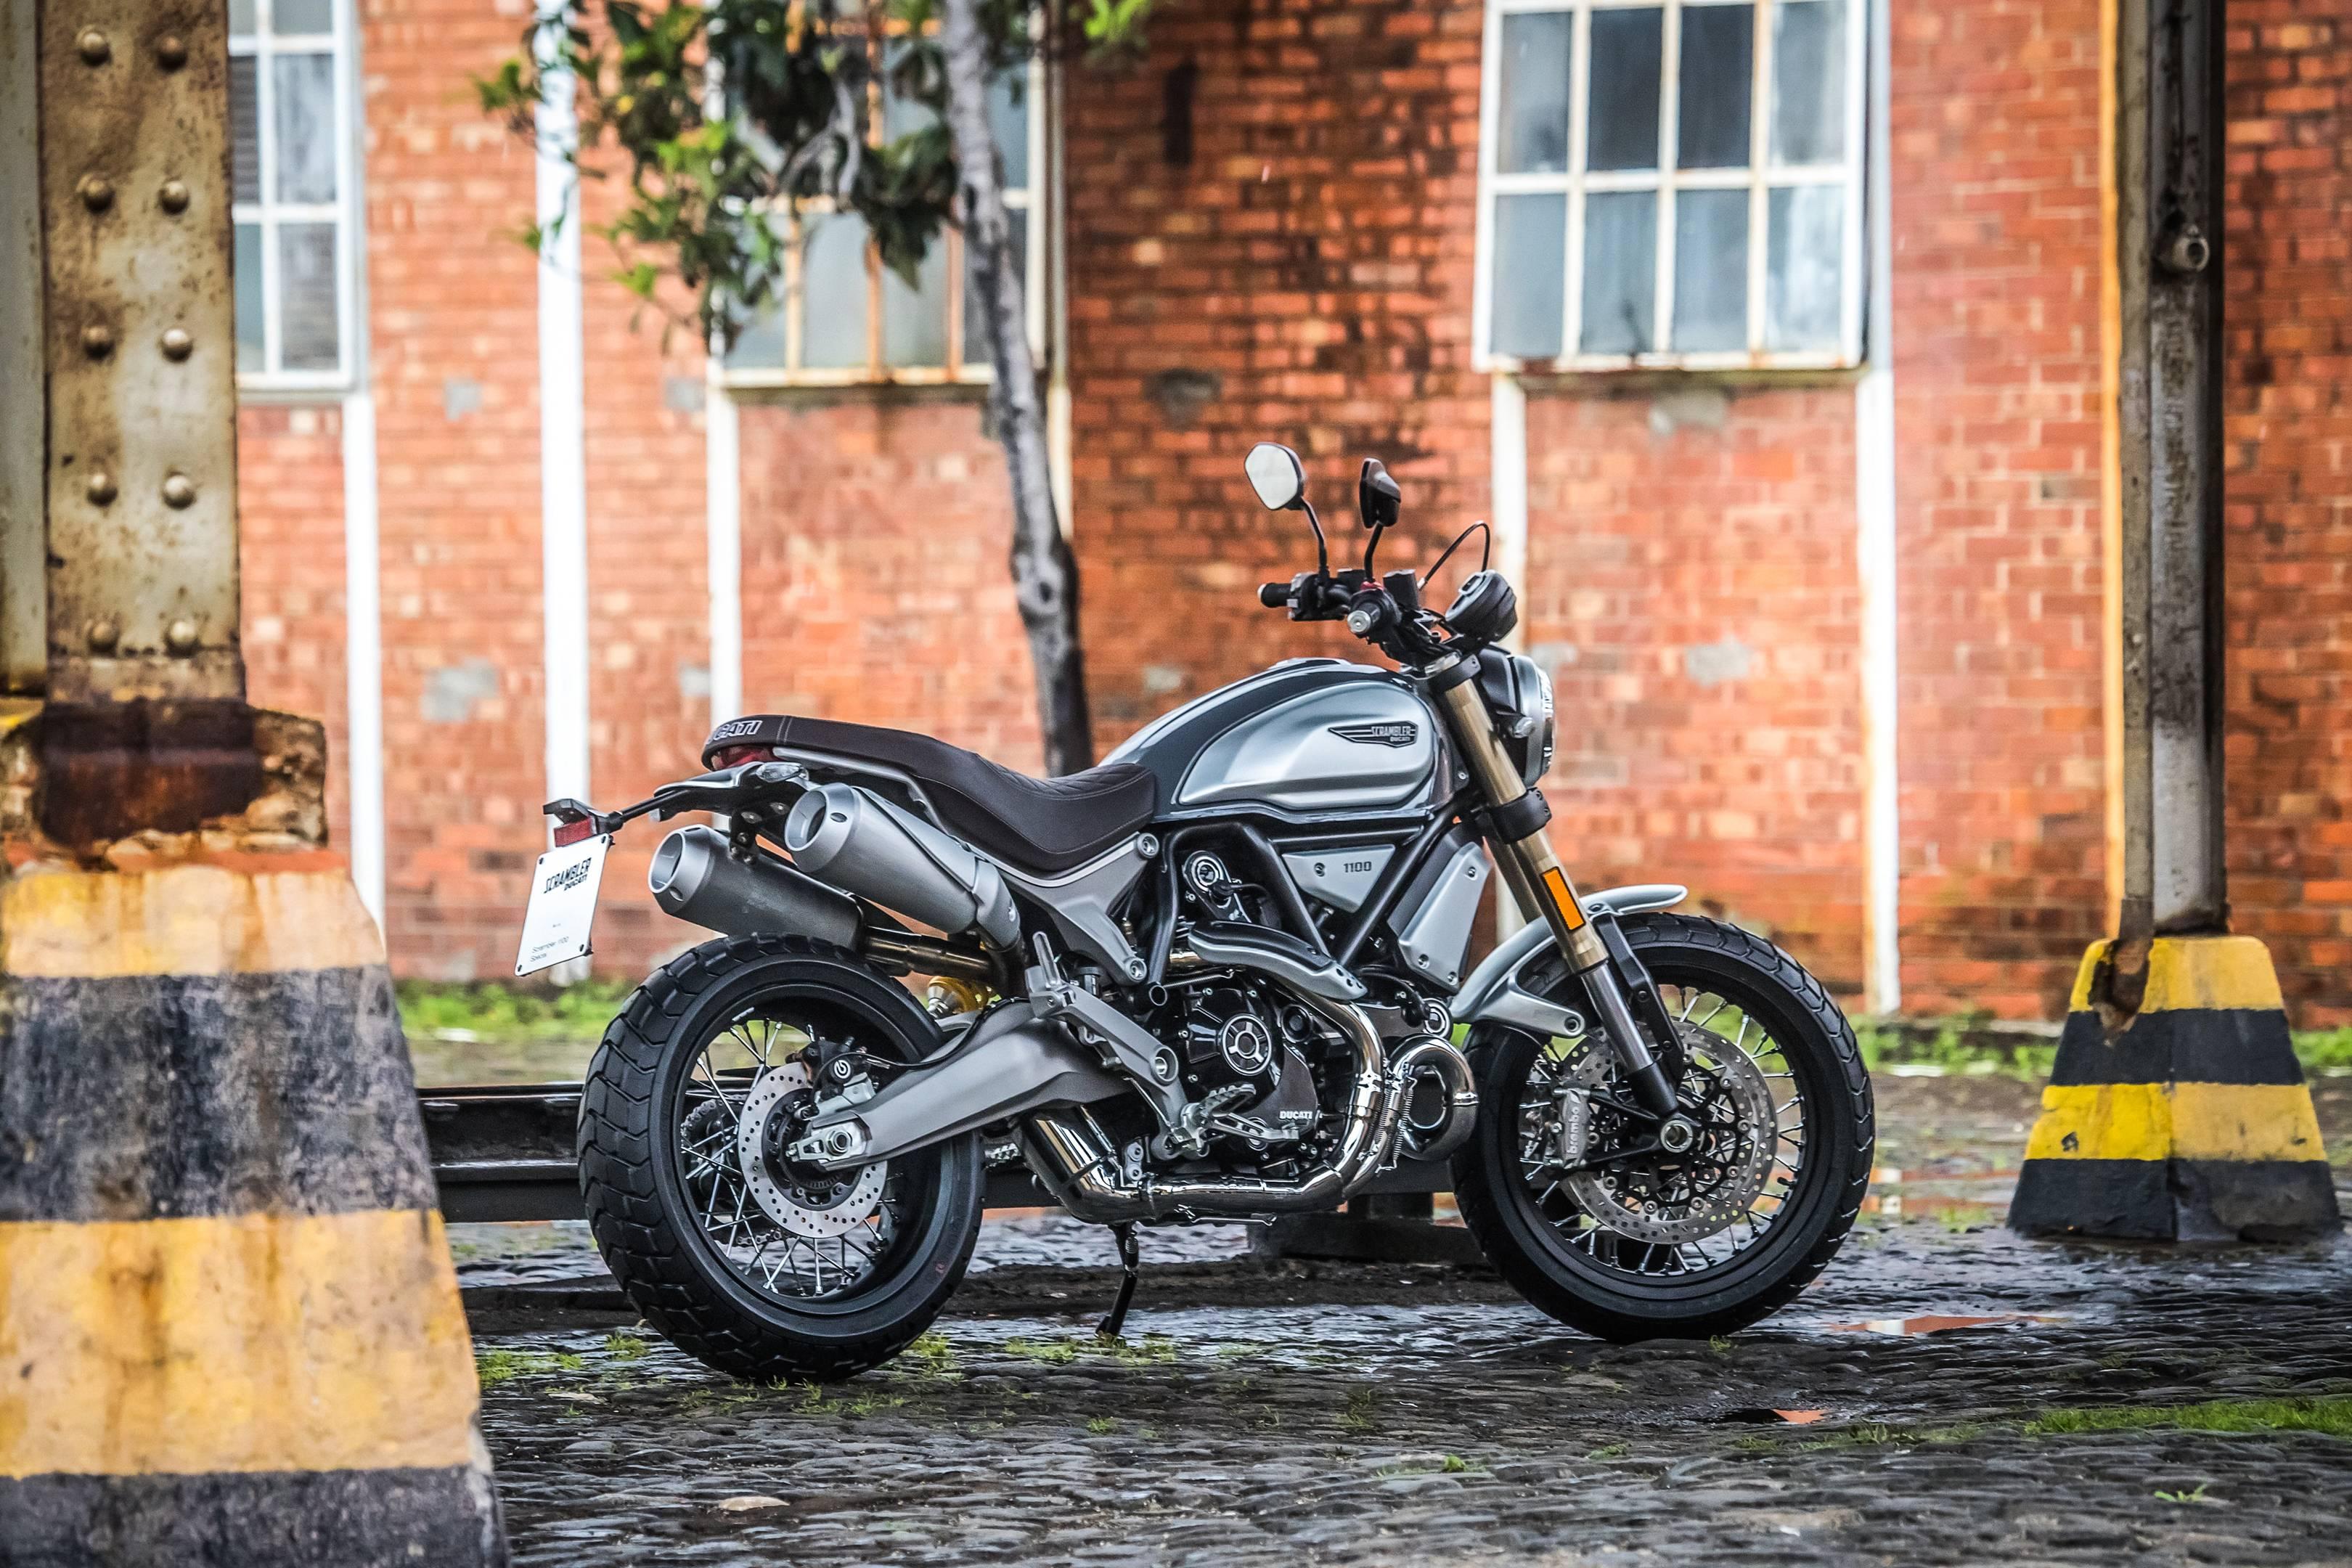 Ducati Scrambler 1100 Review British Gq